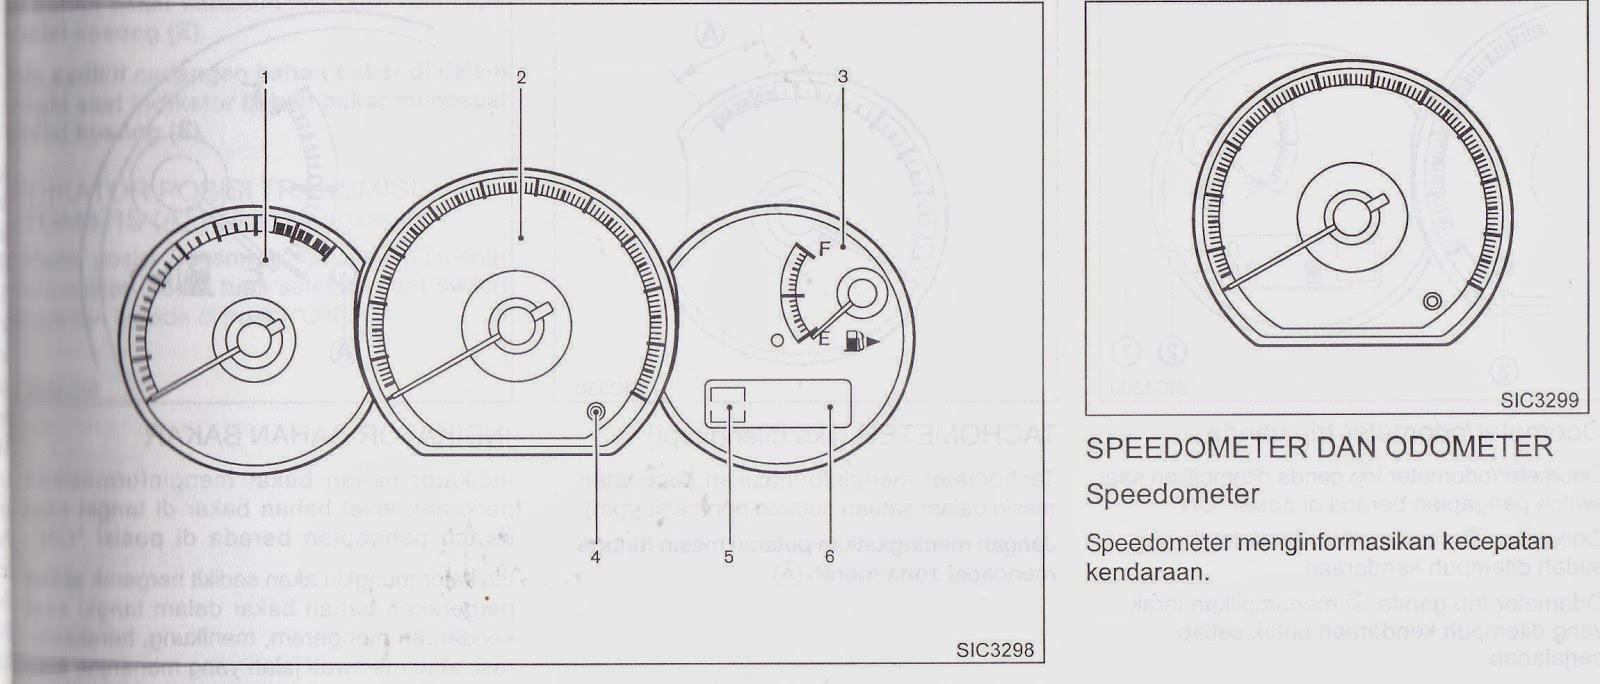 Buku Panduan Nissan Grand Livina 1.8 XV: Maret 2014